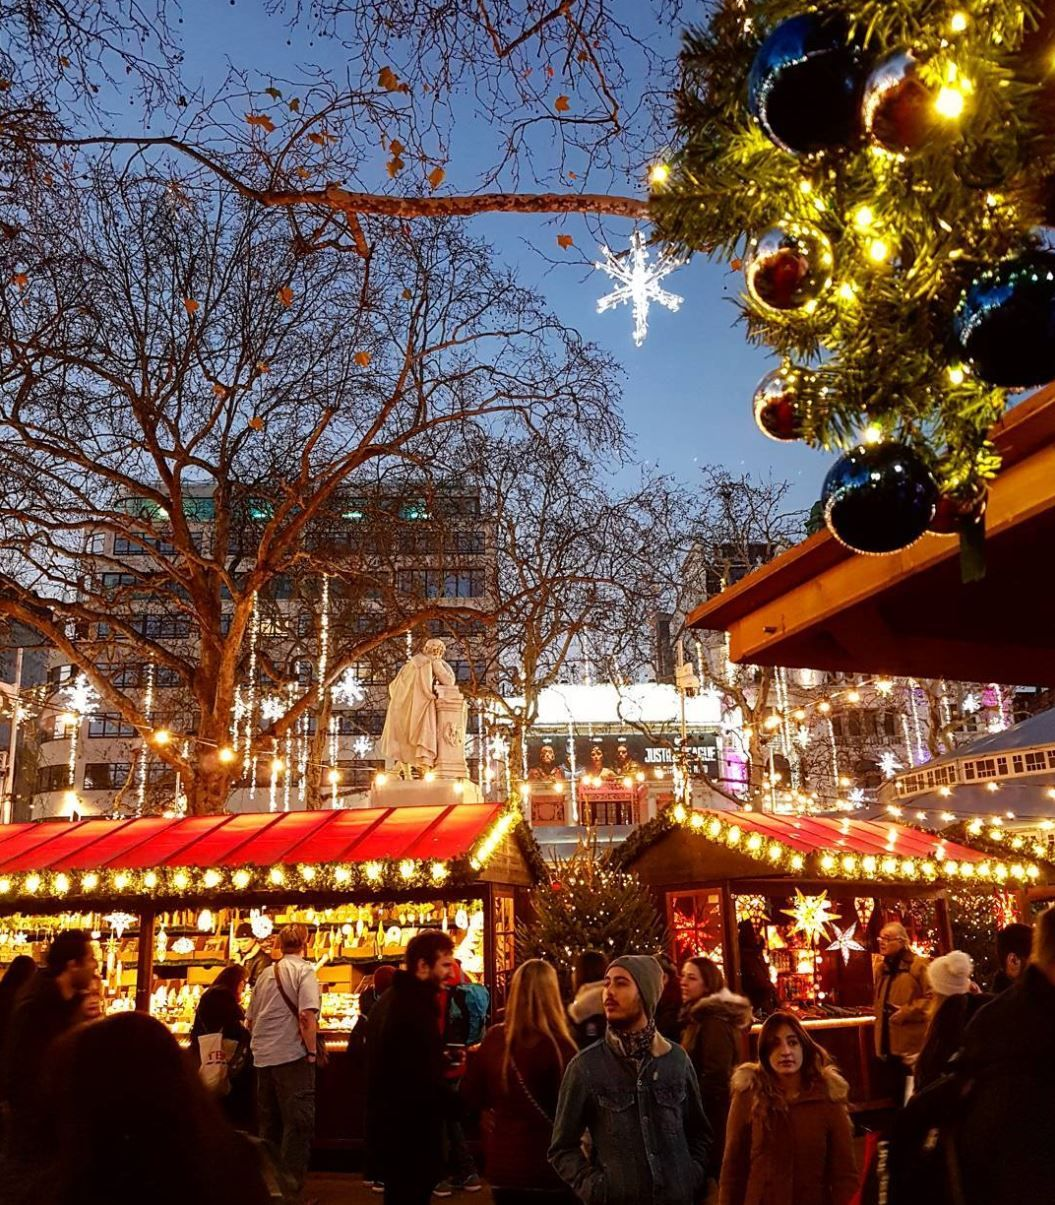 Christmas Markets 2021 Best 10 Christmas Markets In London 2021 London Christmas Christmas Market London Christmas Market